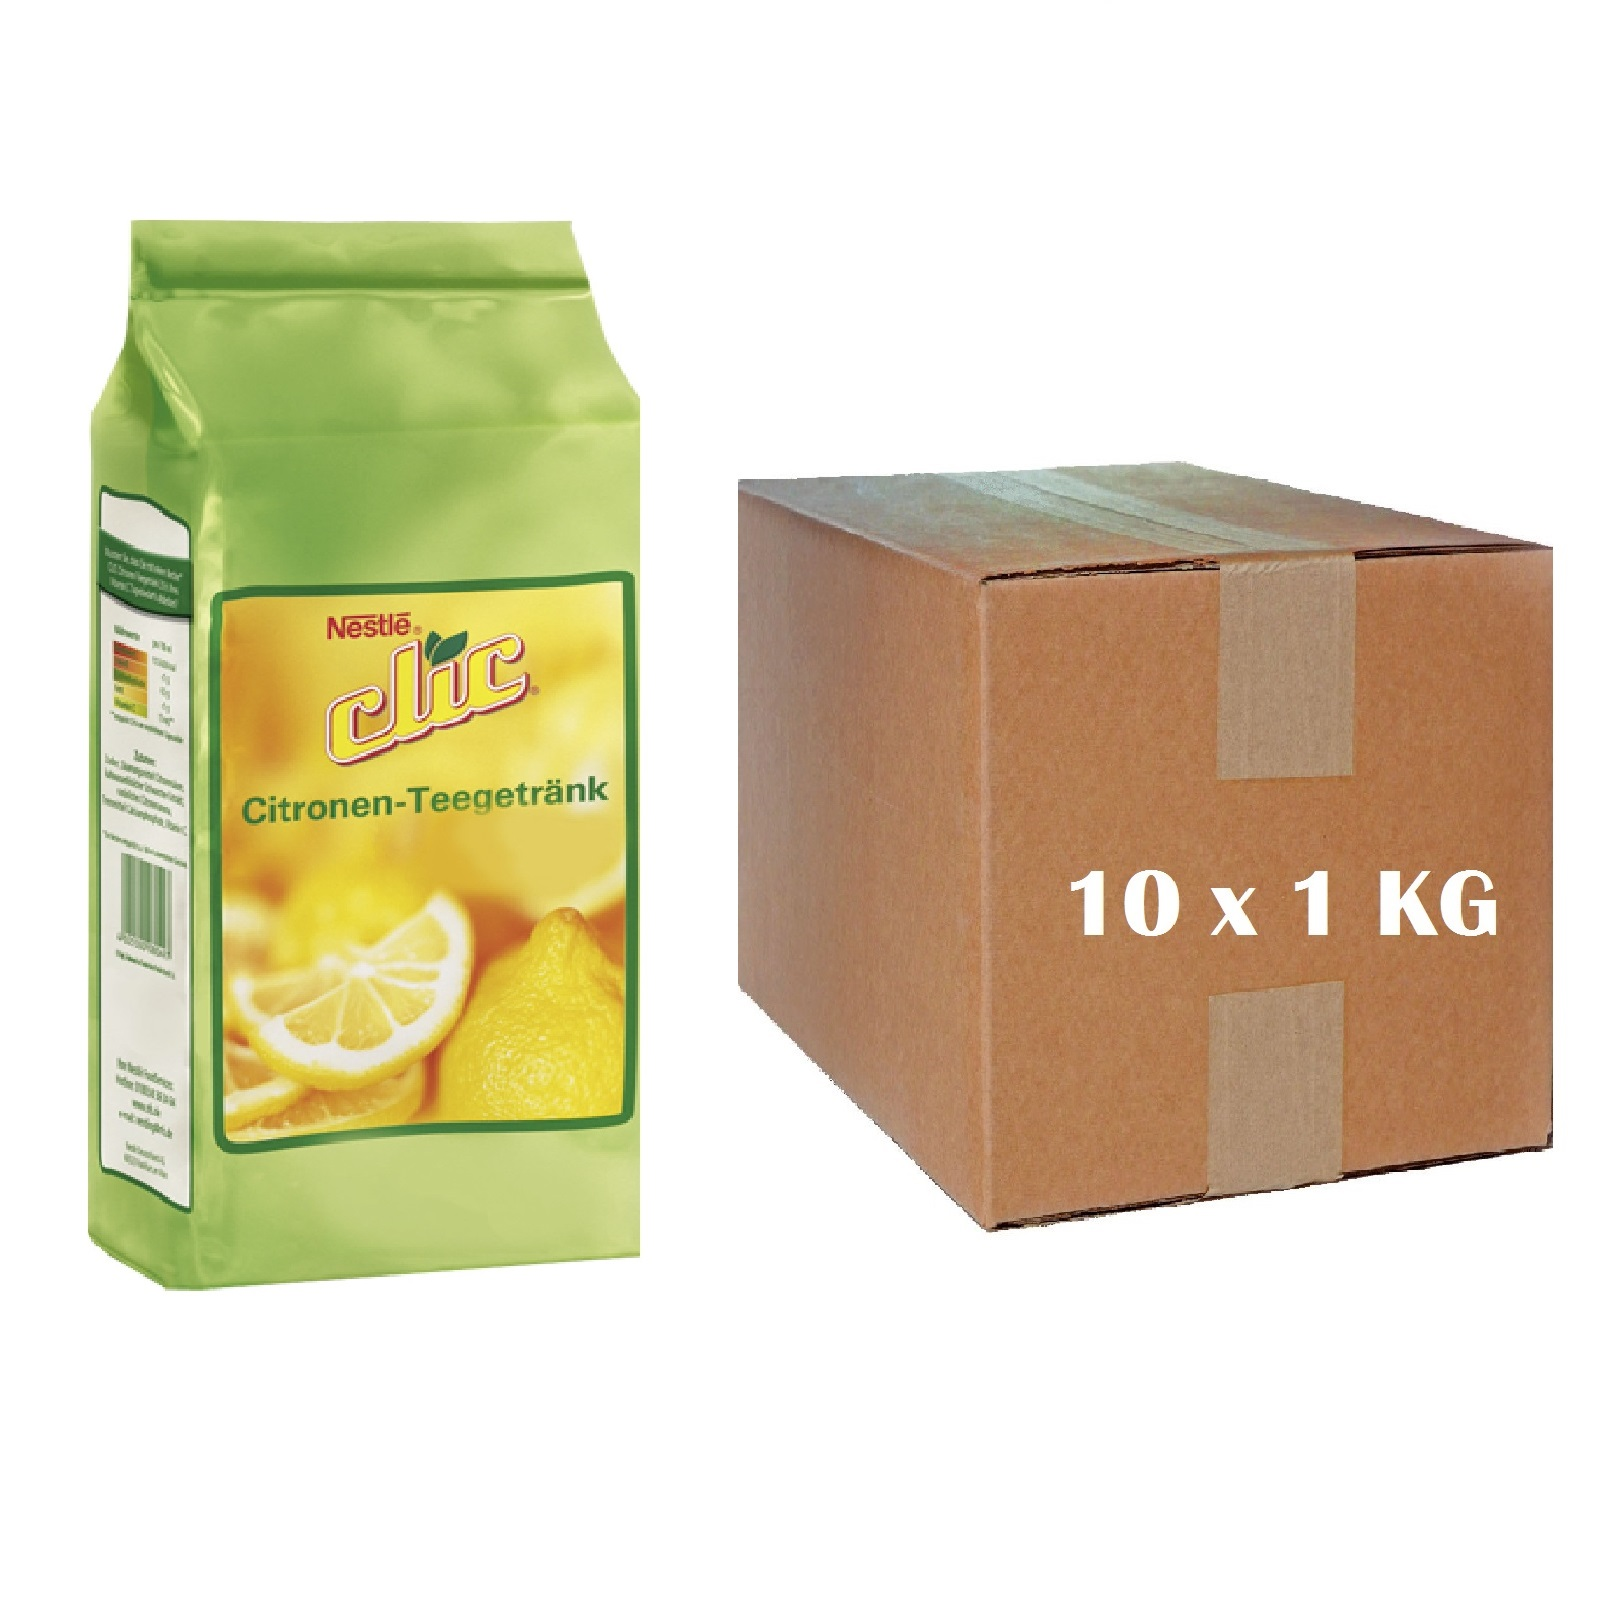 Nestlé Clic Citrone - Karton 10 x 1Kg Zitronen Tee Instant